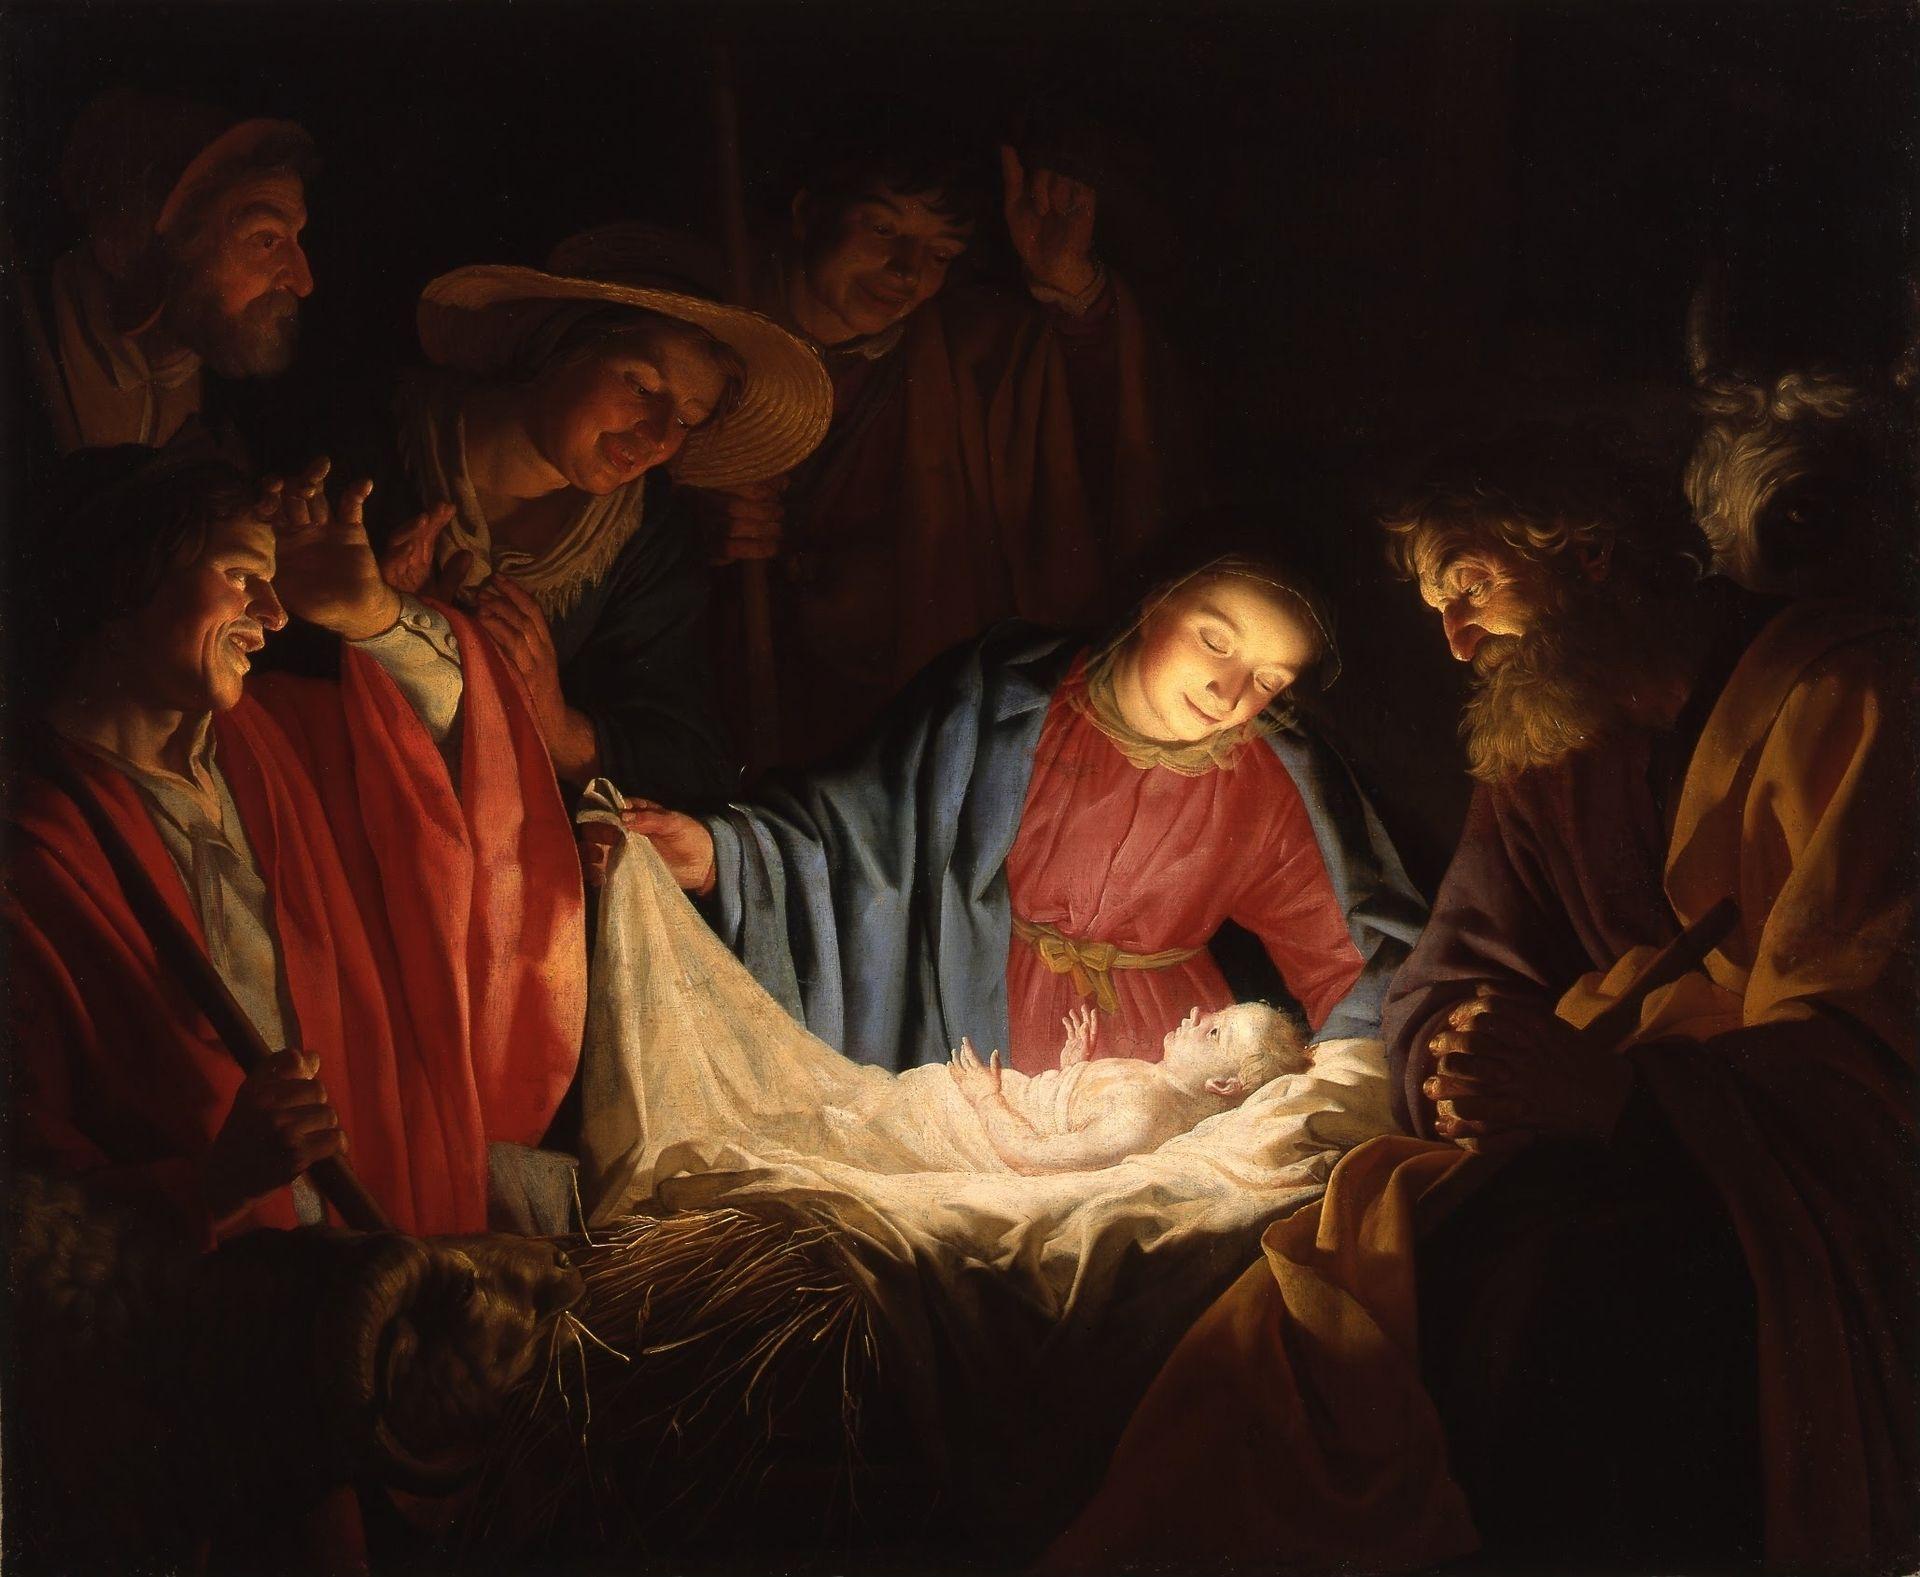 Weihnachten Wikipedia.Gerard Van Honthorst Adoration Of The Shepherds 1622 Nativity